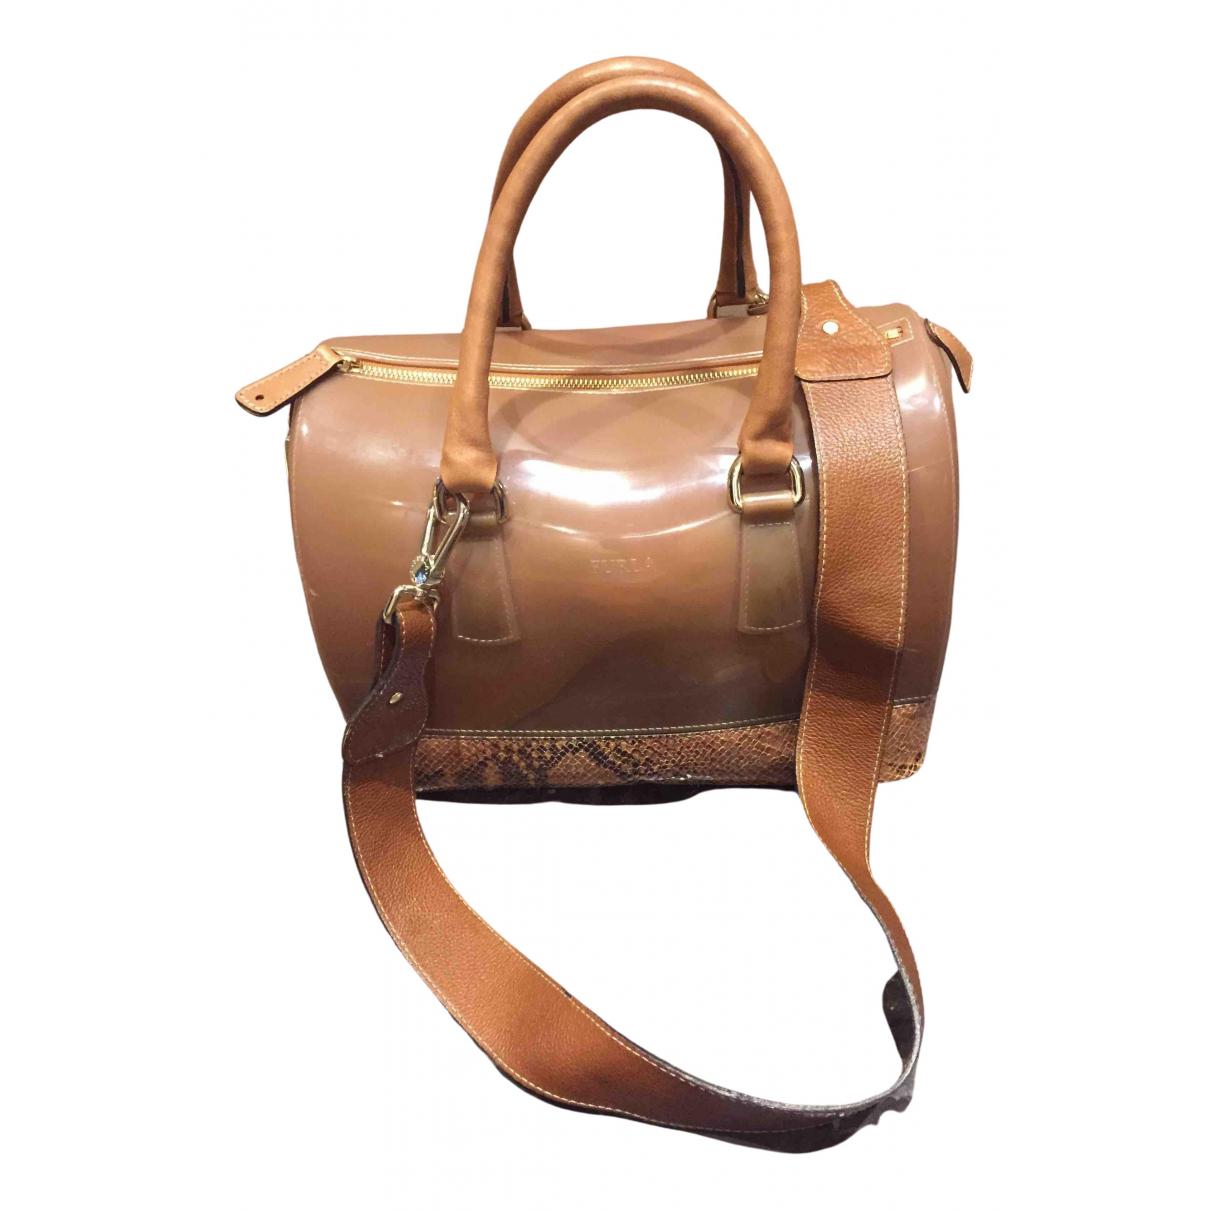 Furla \N Brown handbag for Women \N